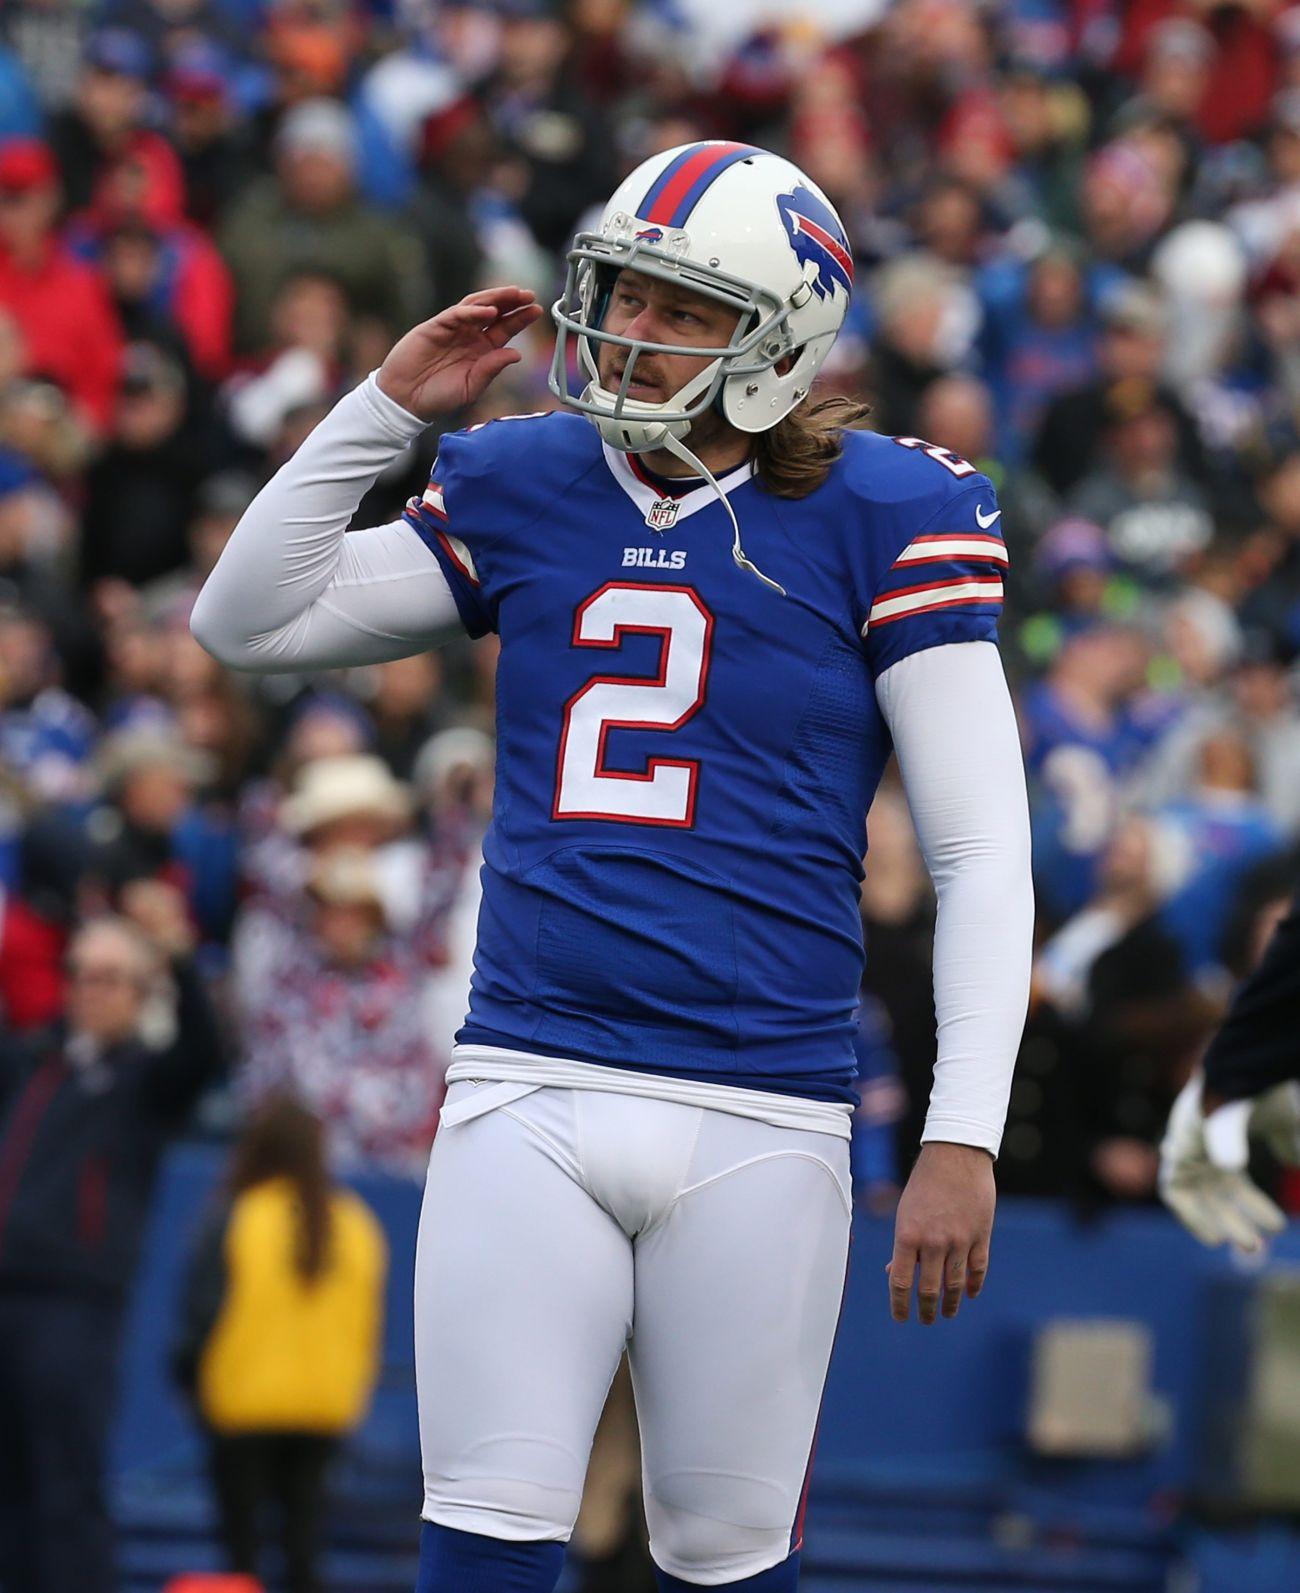 Haircut not a way to cure Carpenter's kicking woes | Buffalo Bills ...